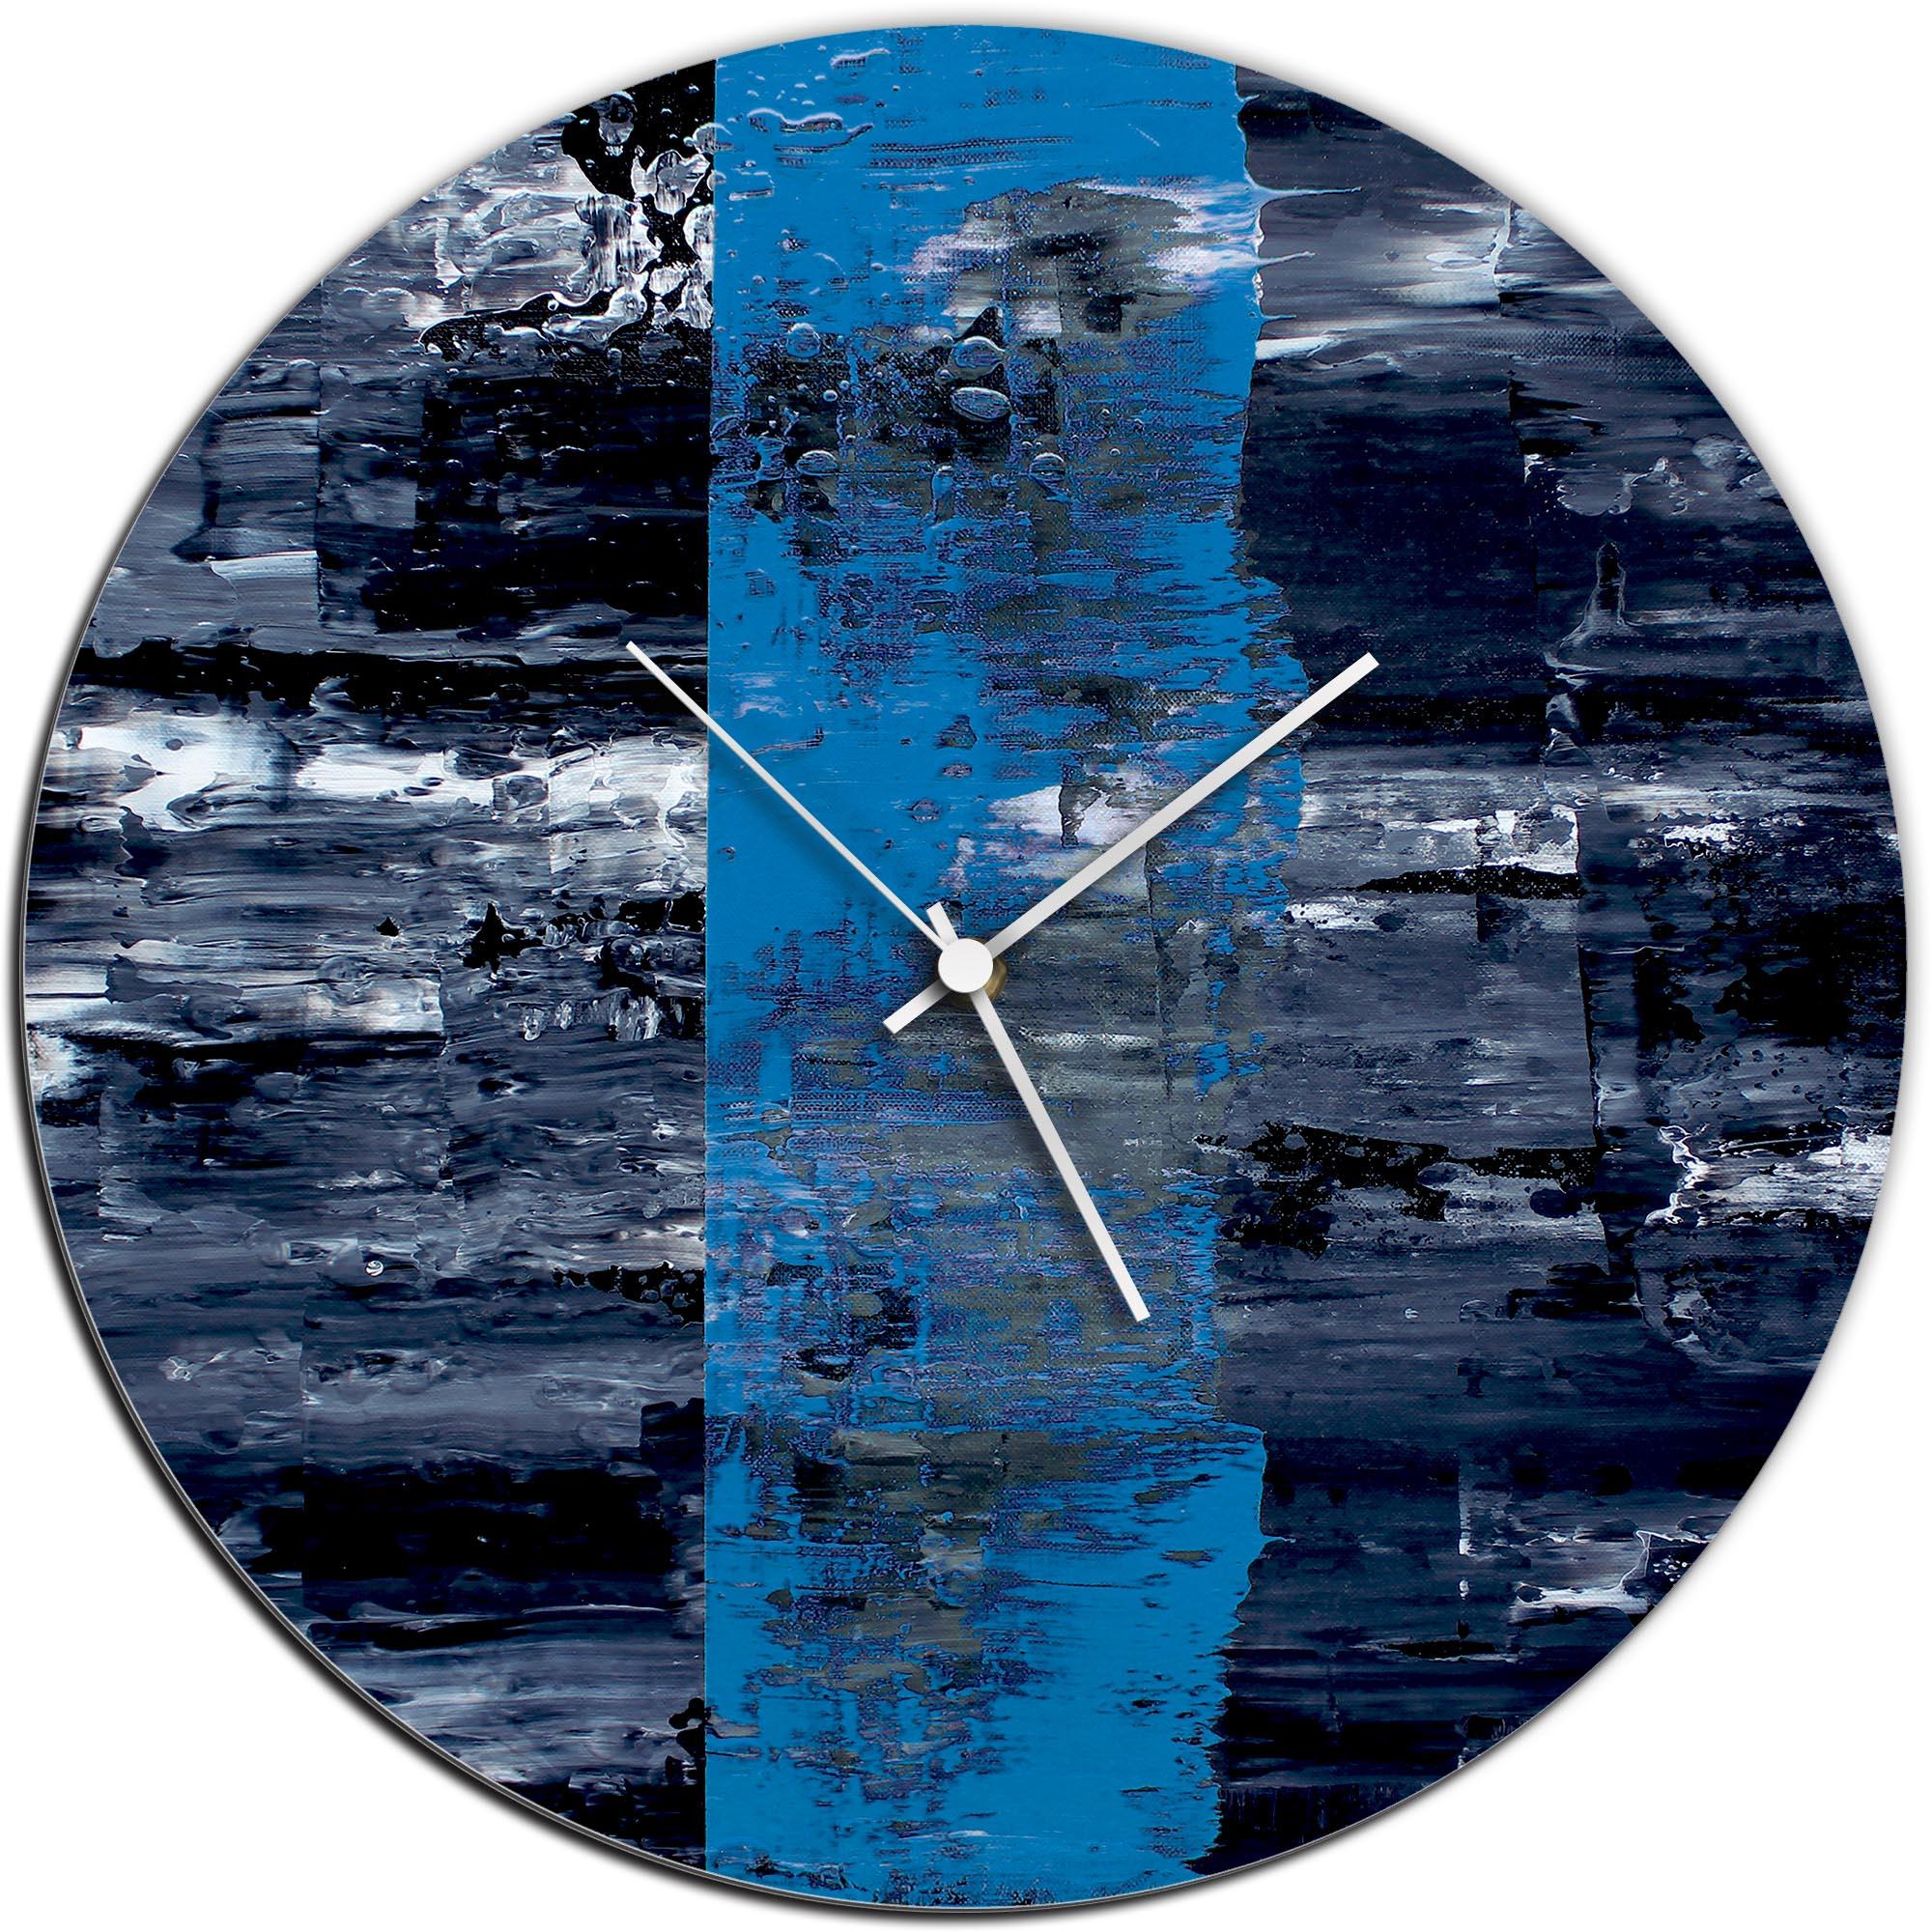 Mendo Vasilevski 'Blue Line Circle Clock' 16in x 16in Modern Wall Clock on Aluminum Composite